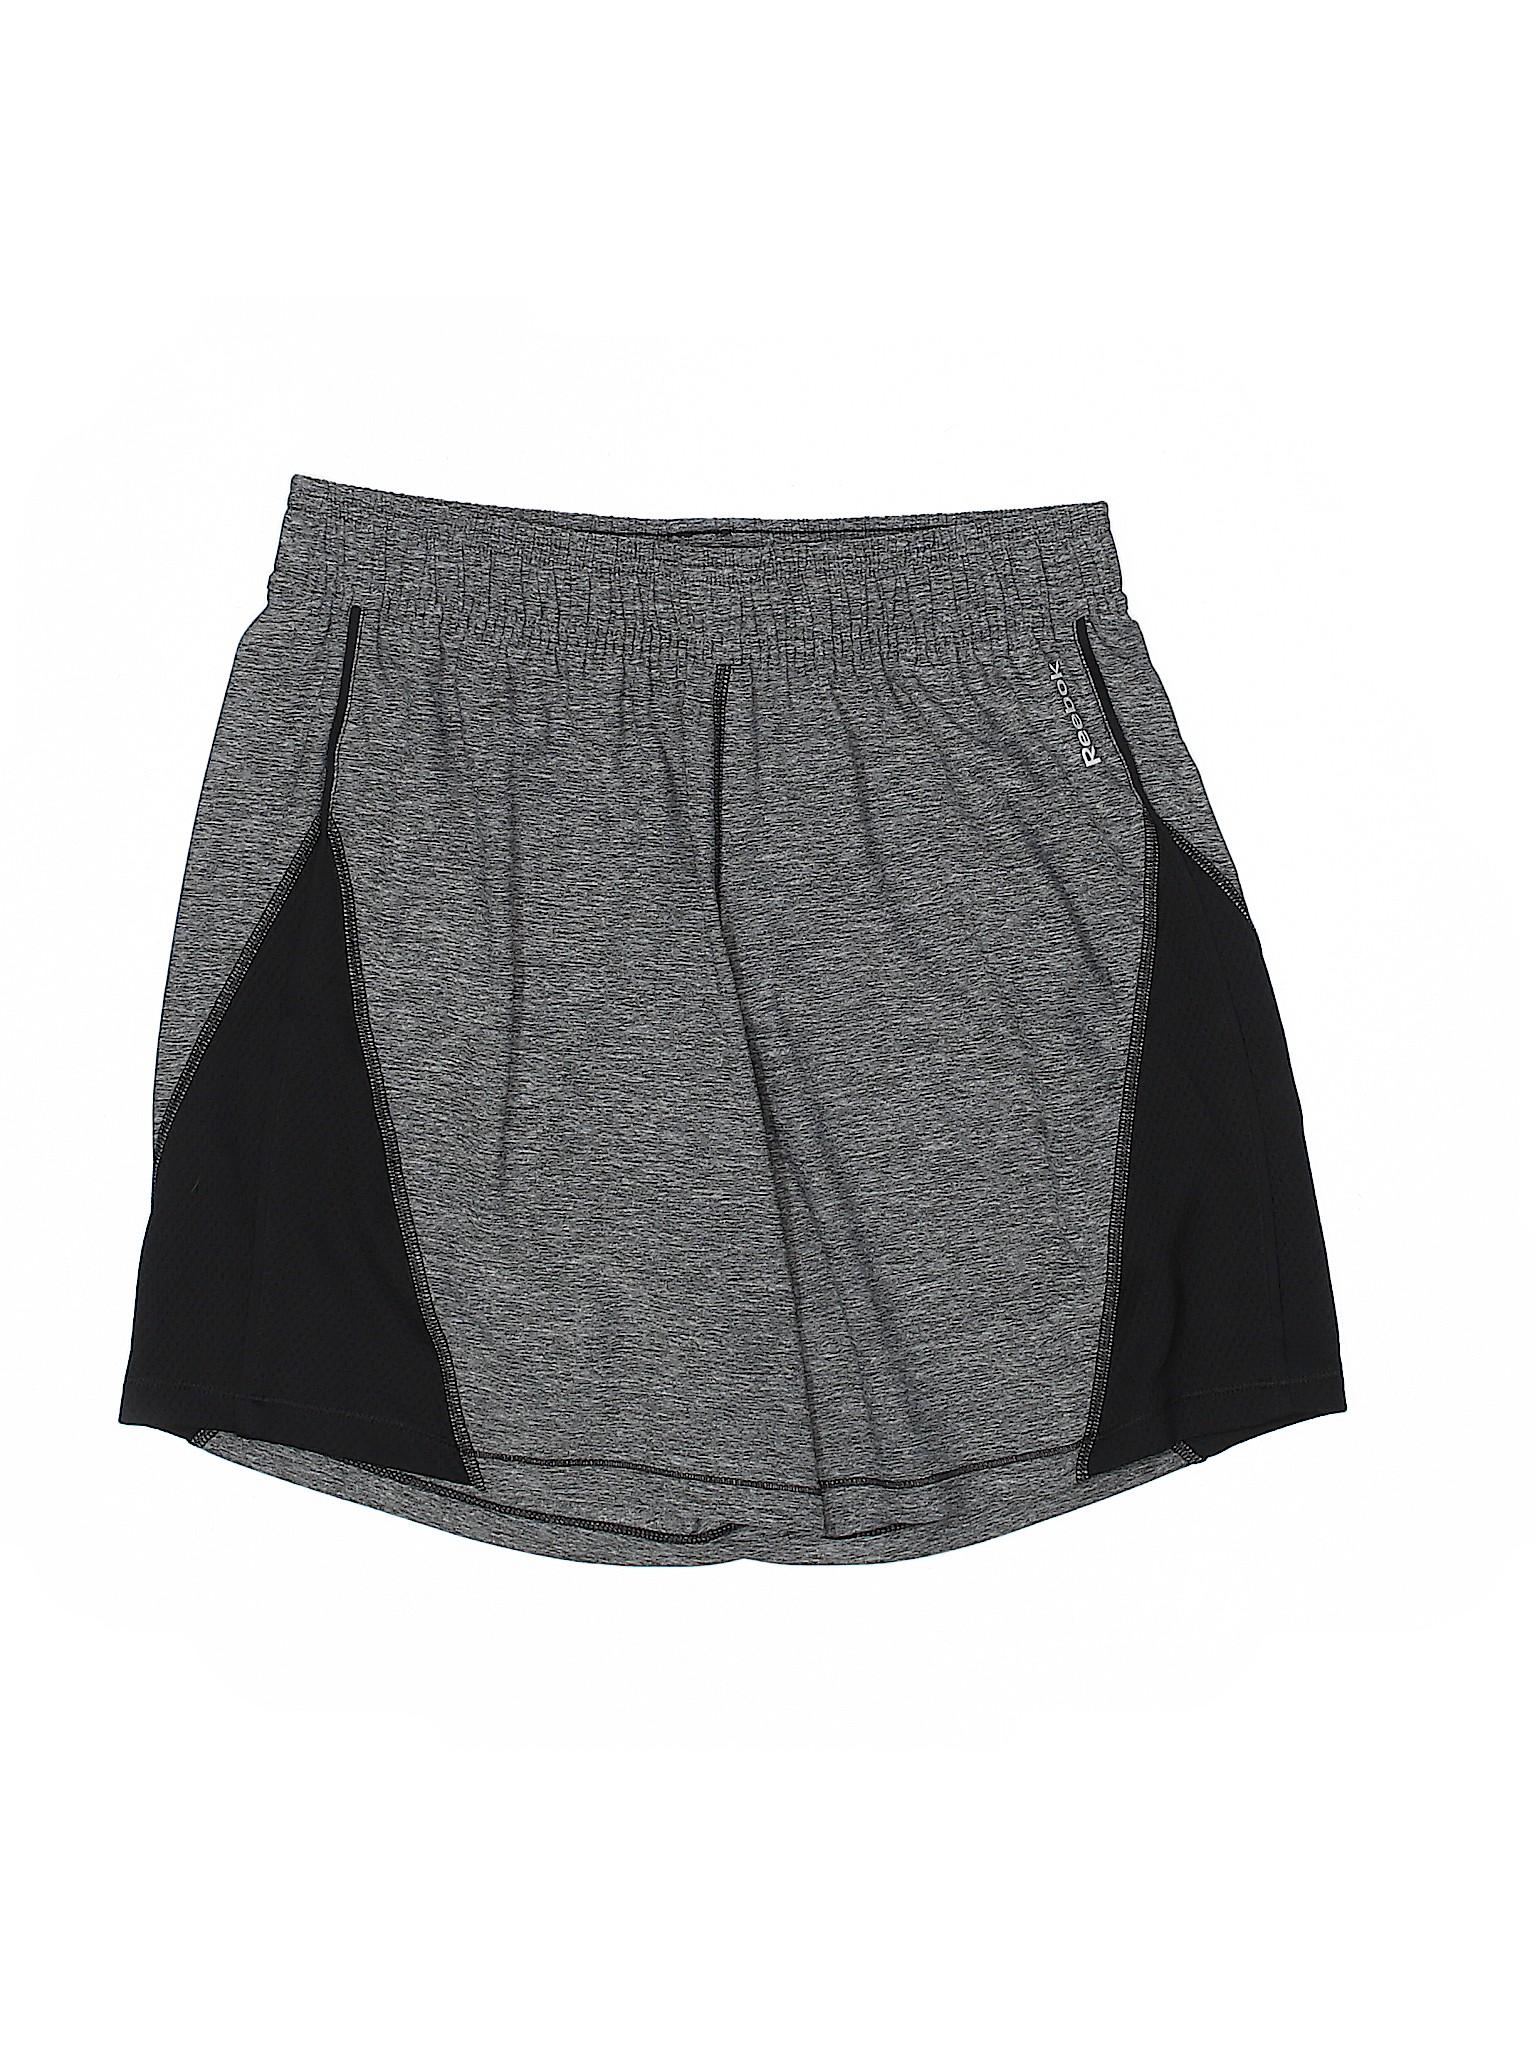 Shorts Reebok Athletic Reebok Shorts Boutique Shorts Athletic Reebok Athletic Boutique Boutique YxOAP